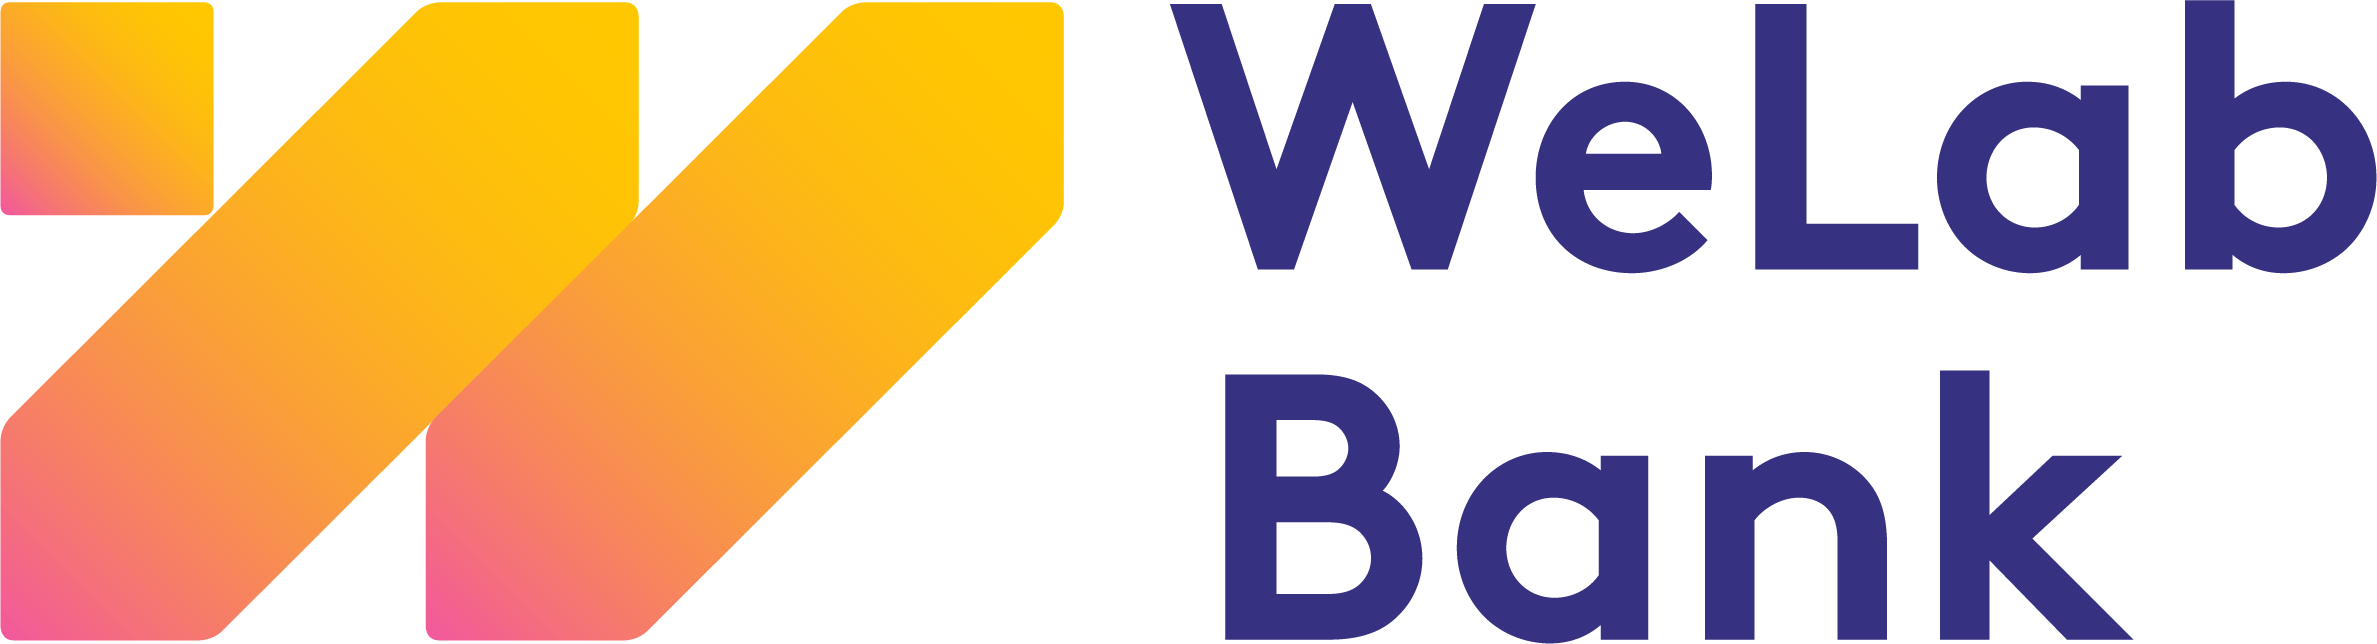 WeLab Bank